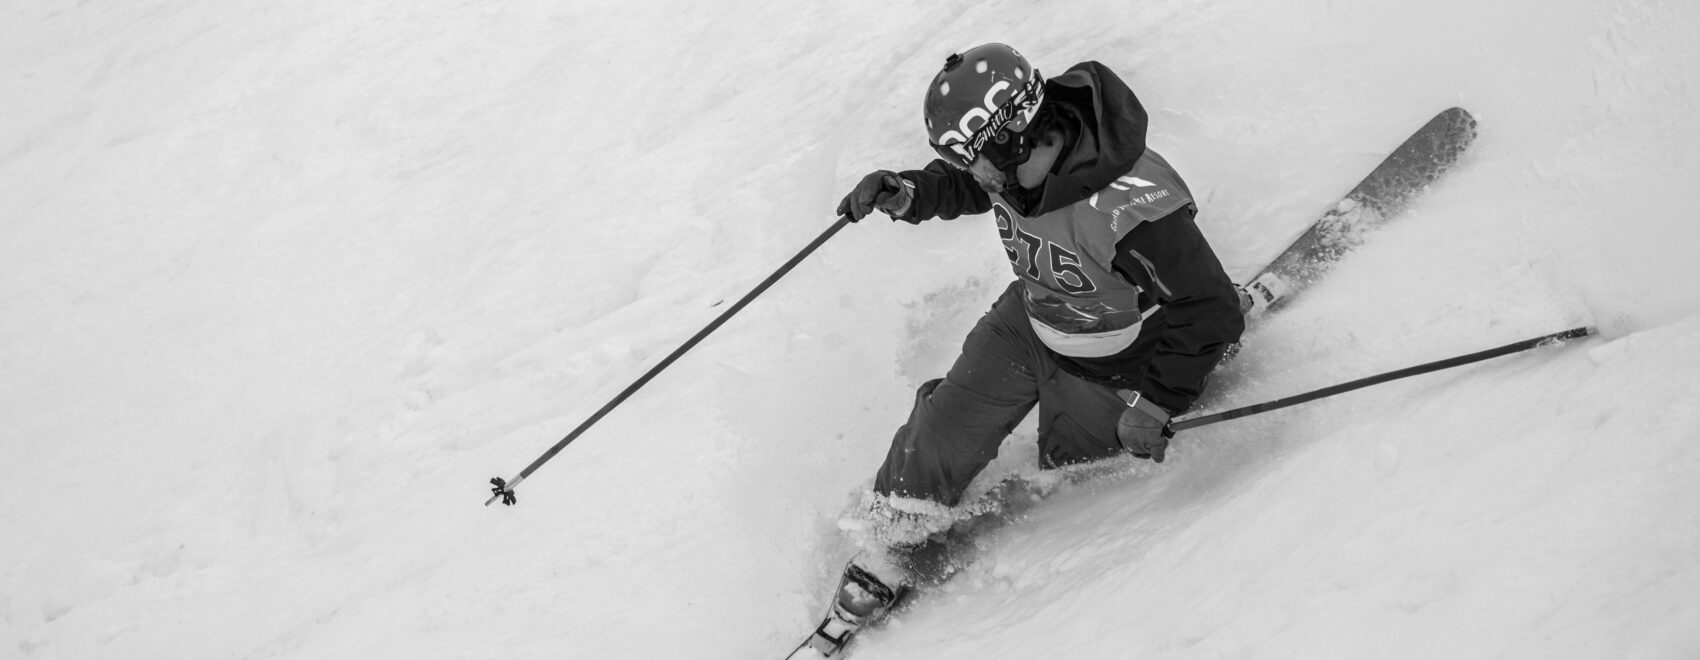 Bjorn Bauer Photography, Freeheel Life Cup, Telemark Big Mountain Telemark